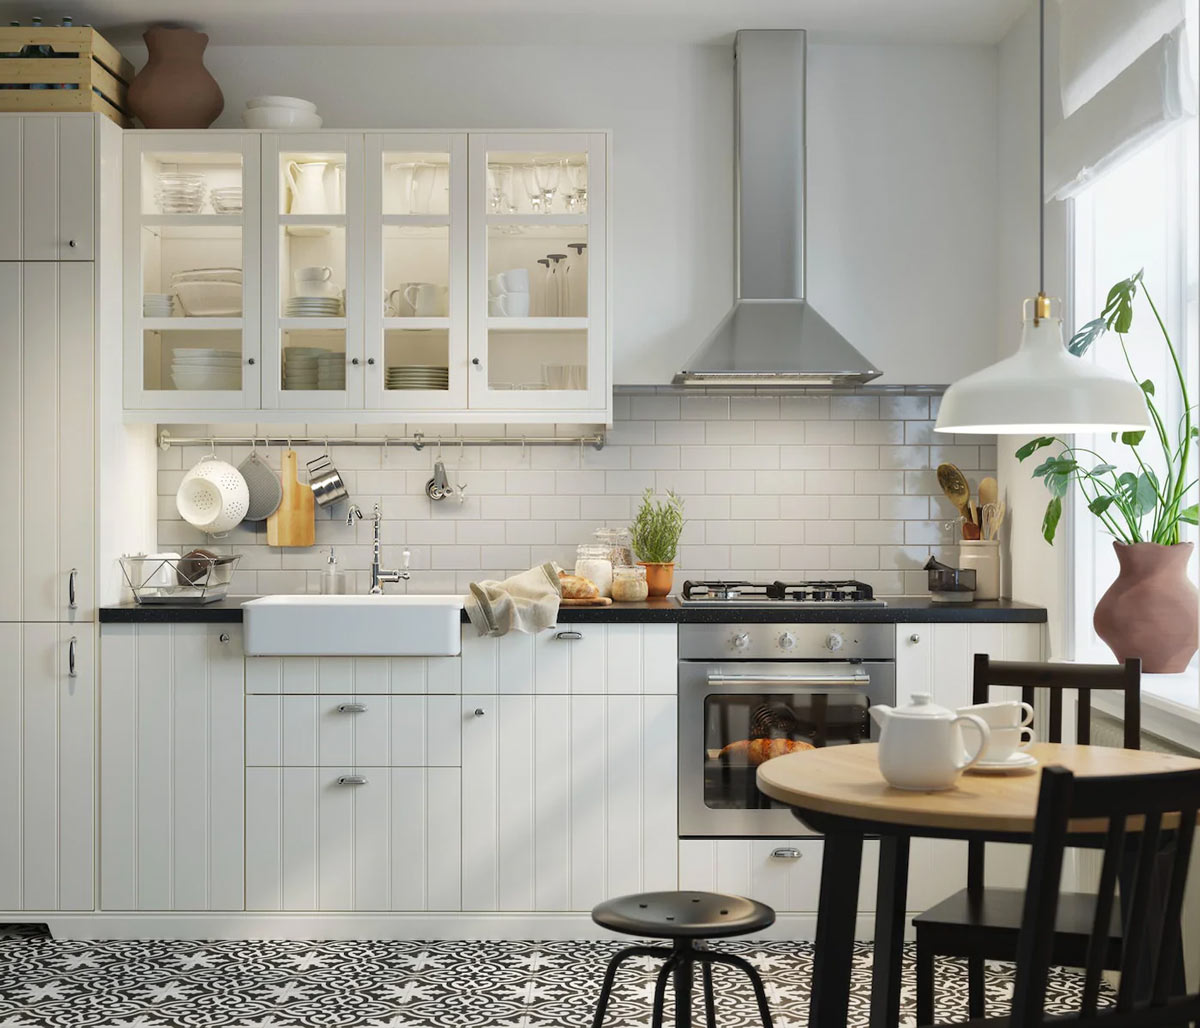 4.4 cucine shabby chic ikea. Ikea Shabby Chic Quando La Casa Veste Shabby Con Ikea